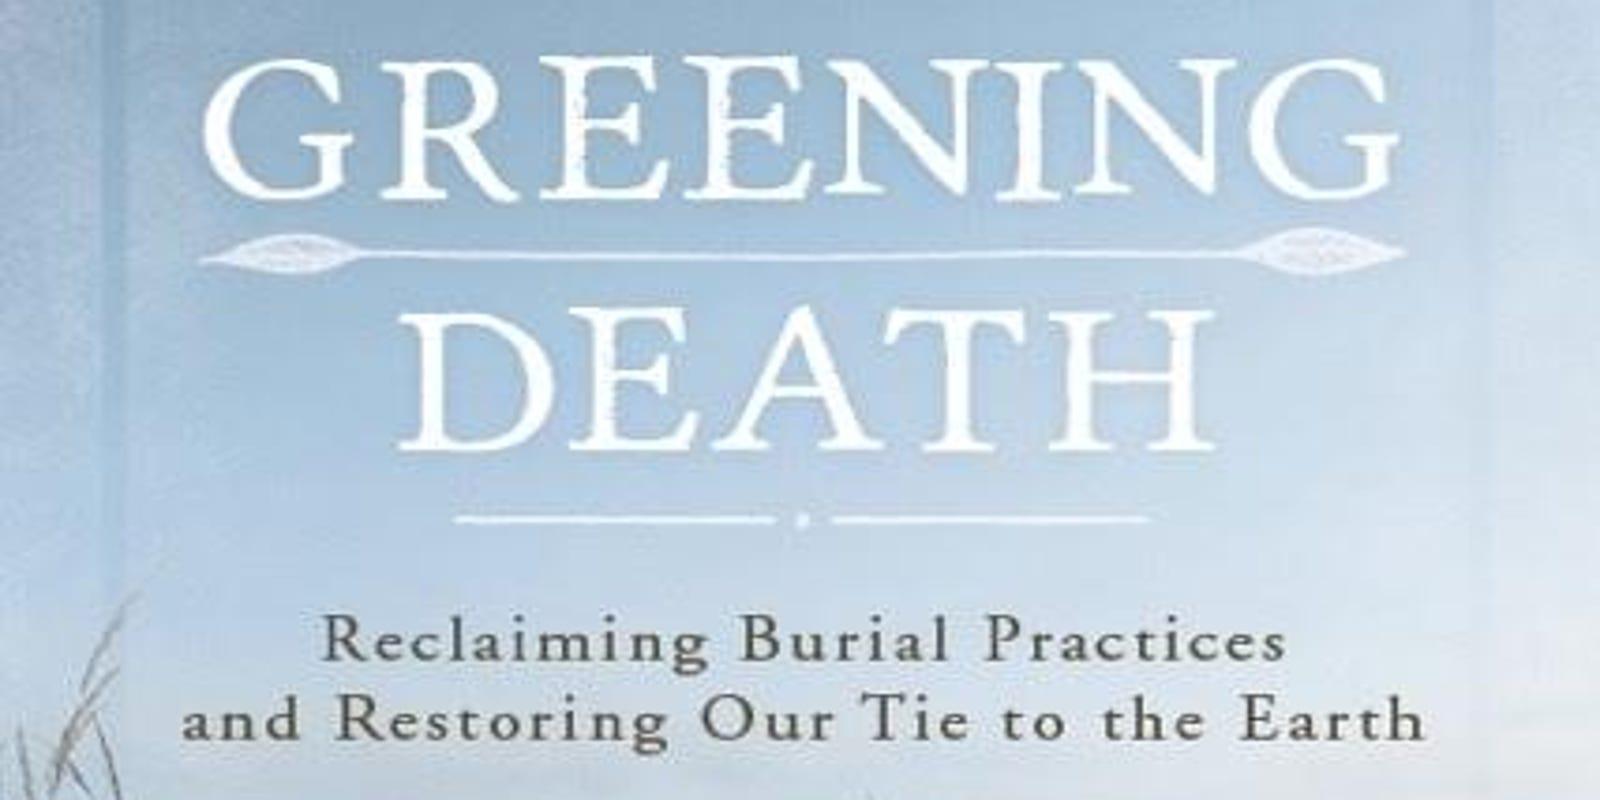 Ecofriendly burials a budding movement